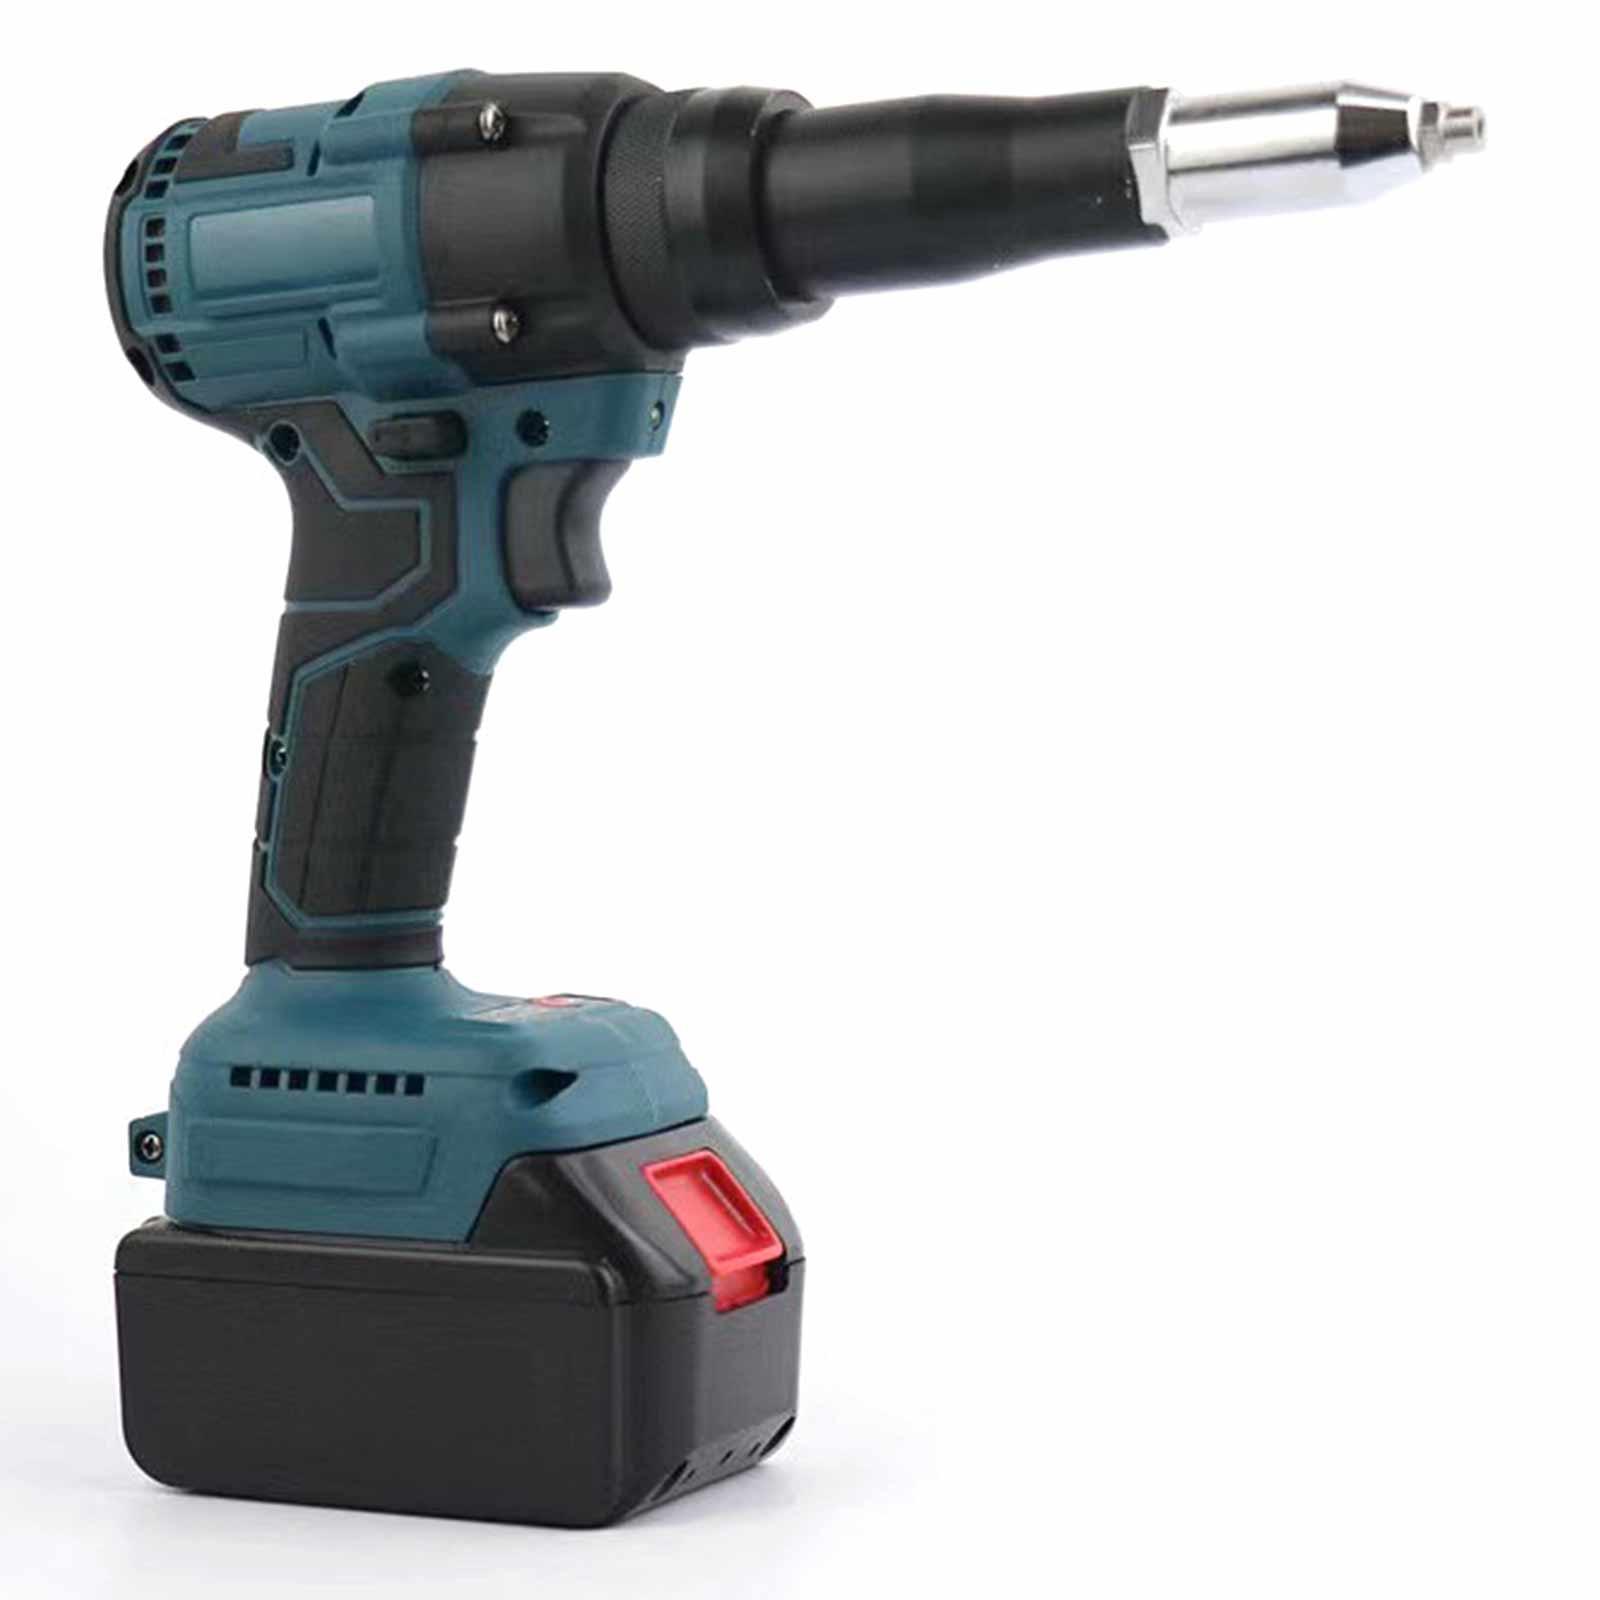 Electric Rivet Gun Cordless Rivet Nut Gun Drill Insert Pull Riveting Tool 3.2-5.2mm with LED Light for Makita 10*1800mAh Battery